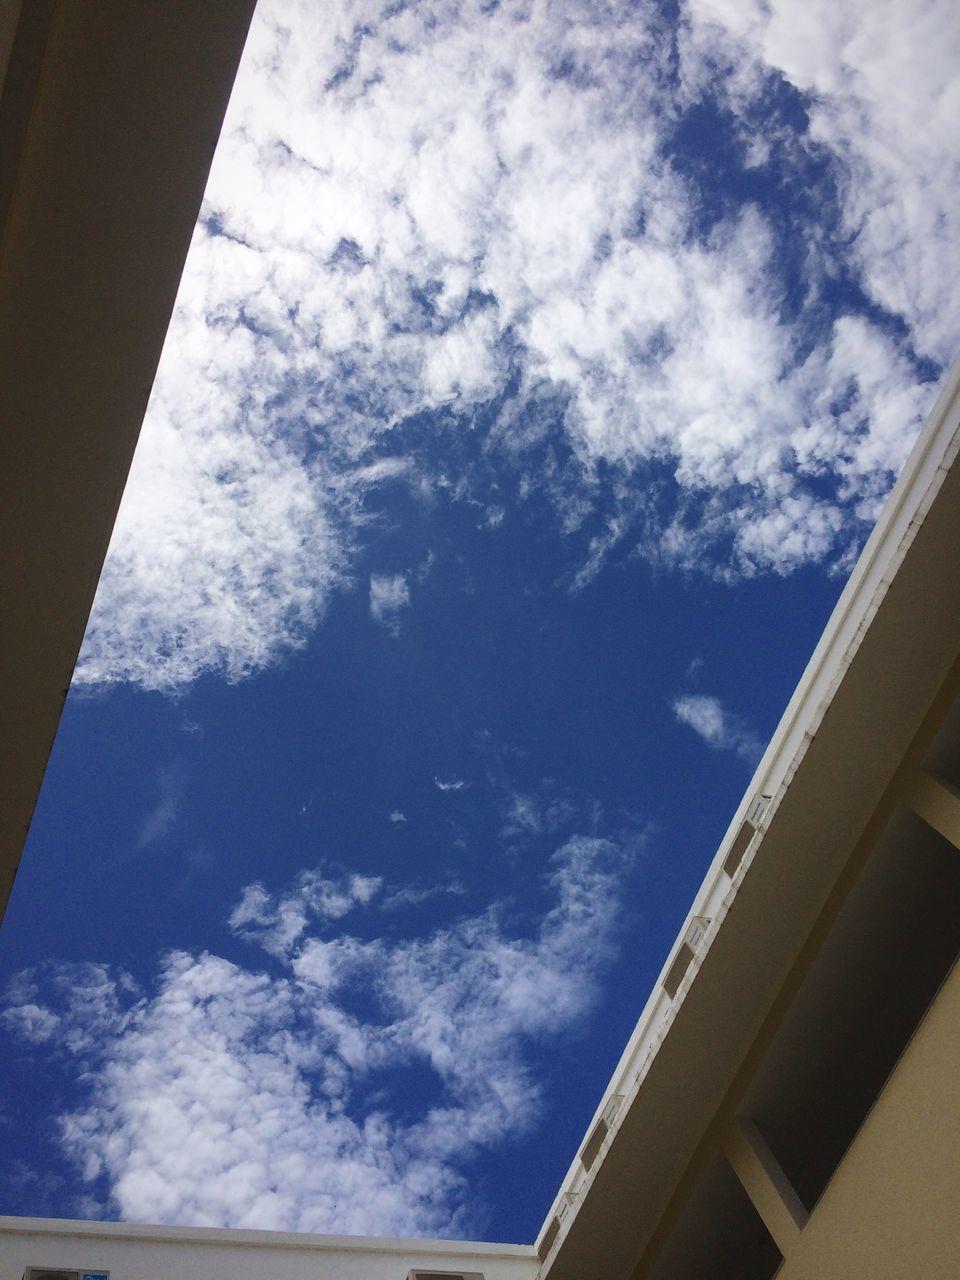 DIRECTLY BELOW SHOT OF SKY